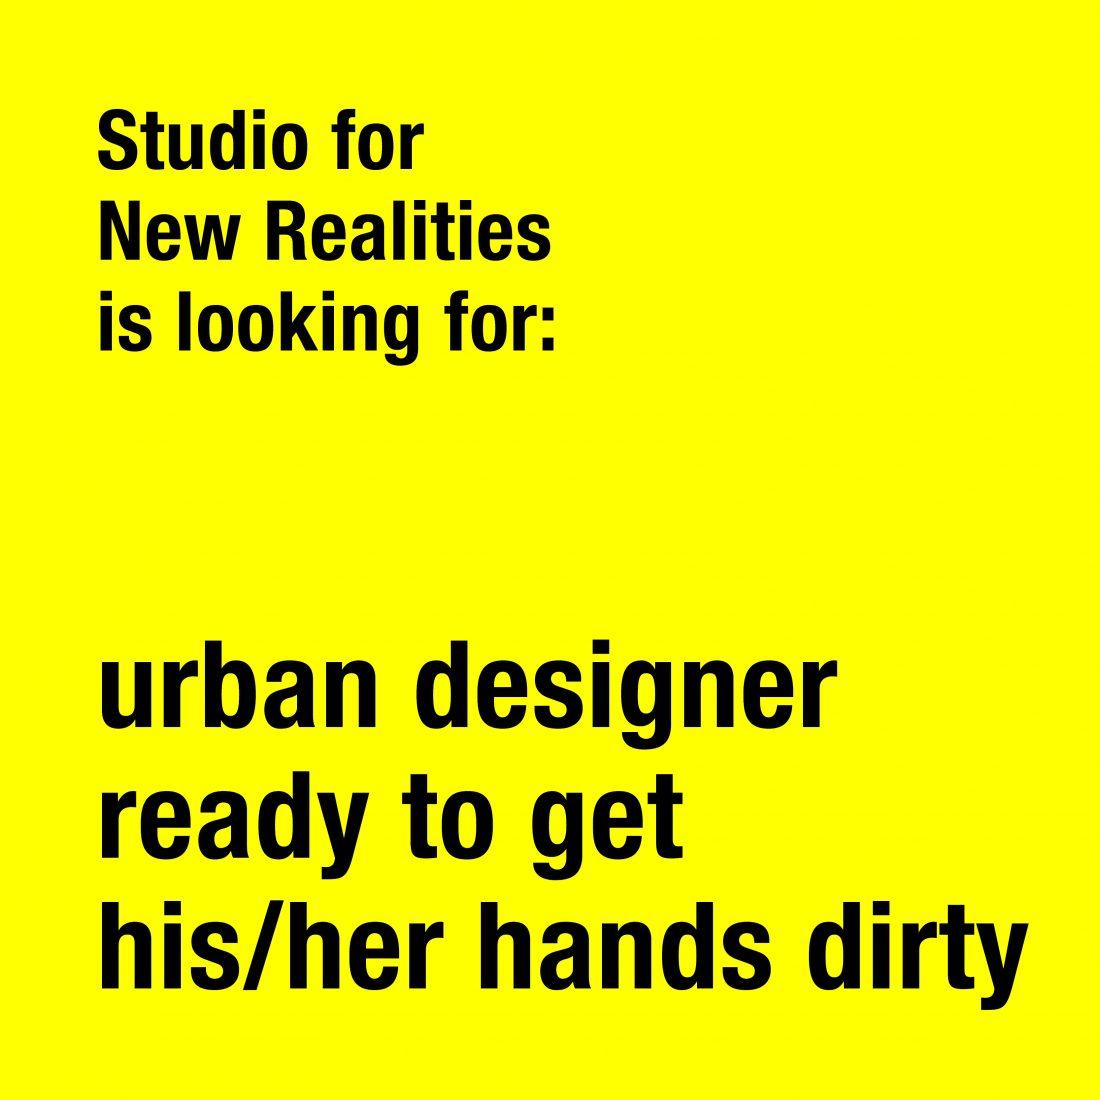 210601 Urban Designer helderder geel